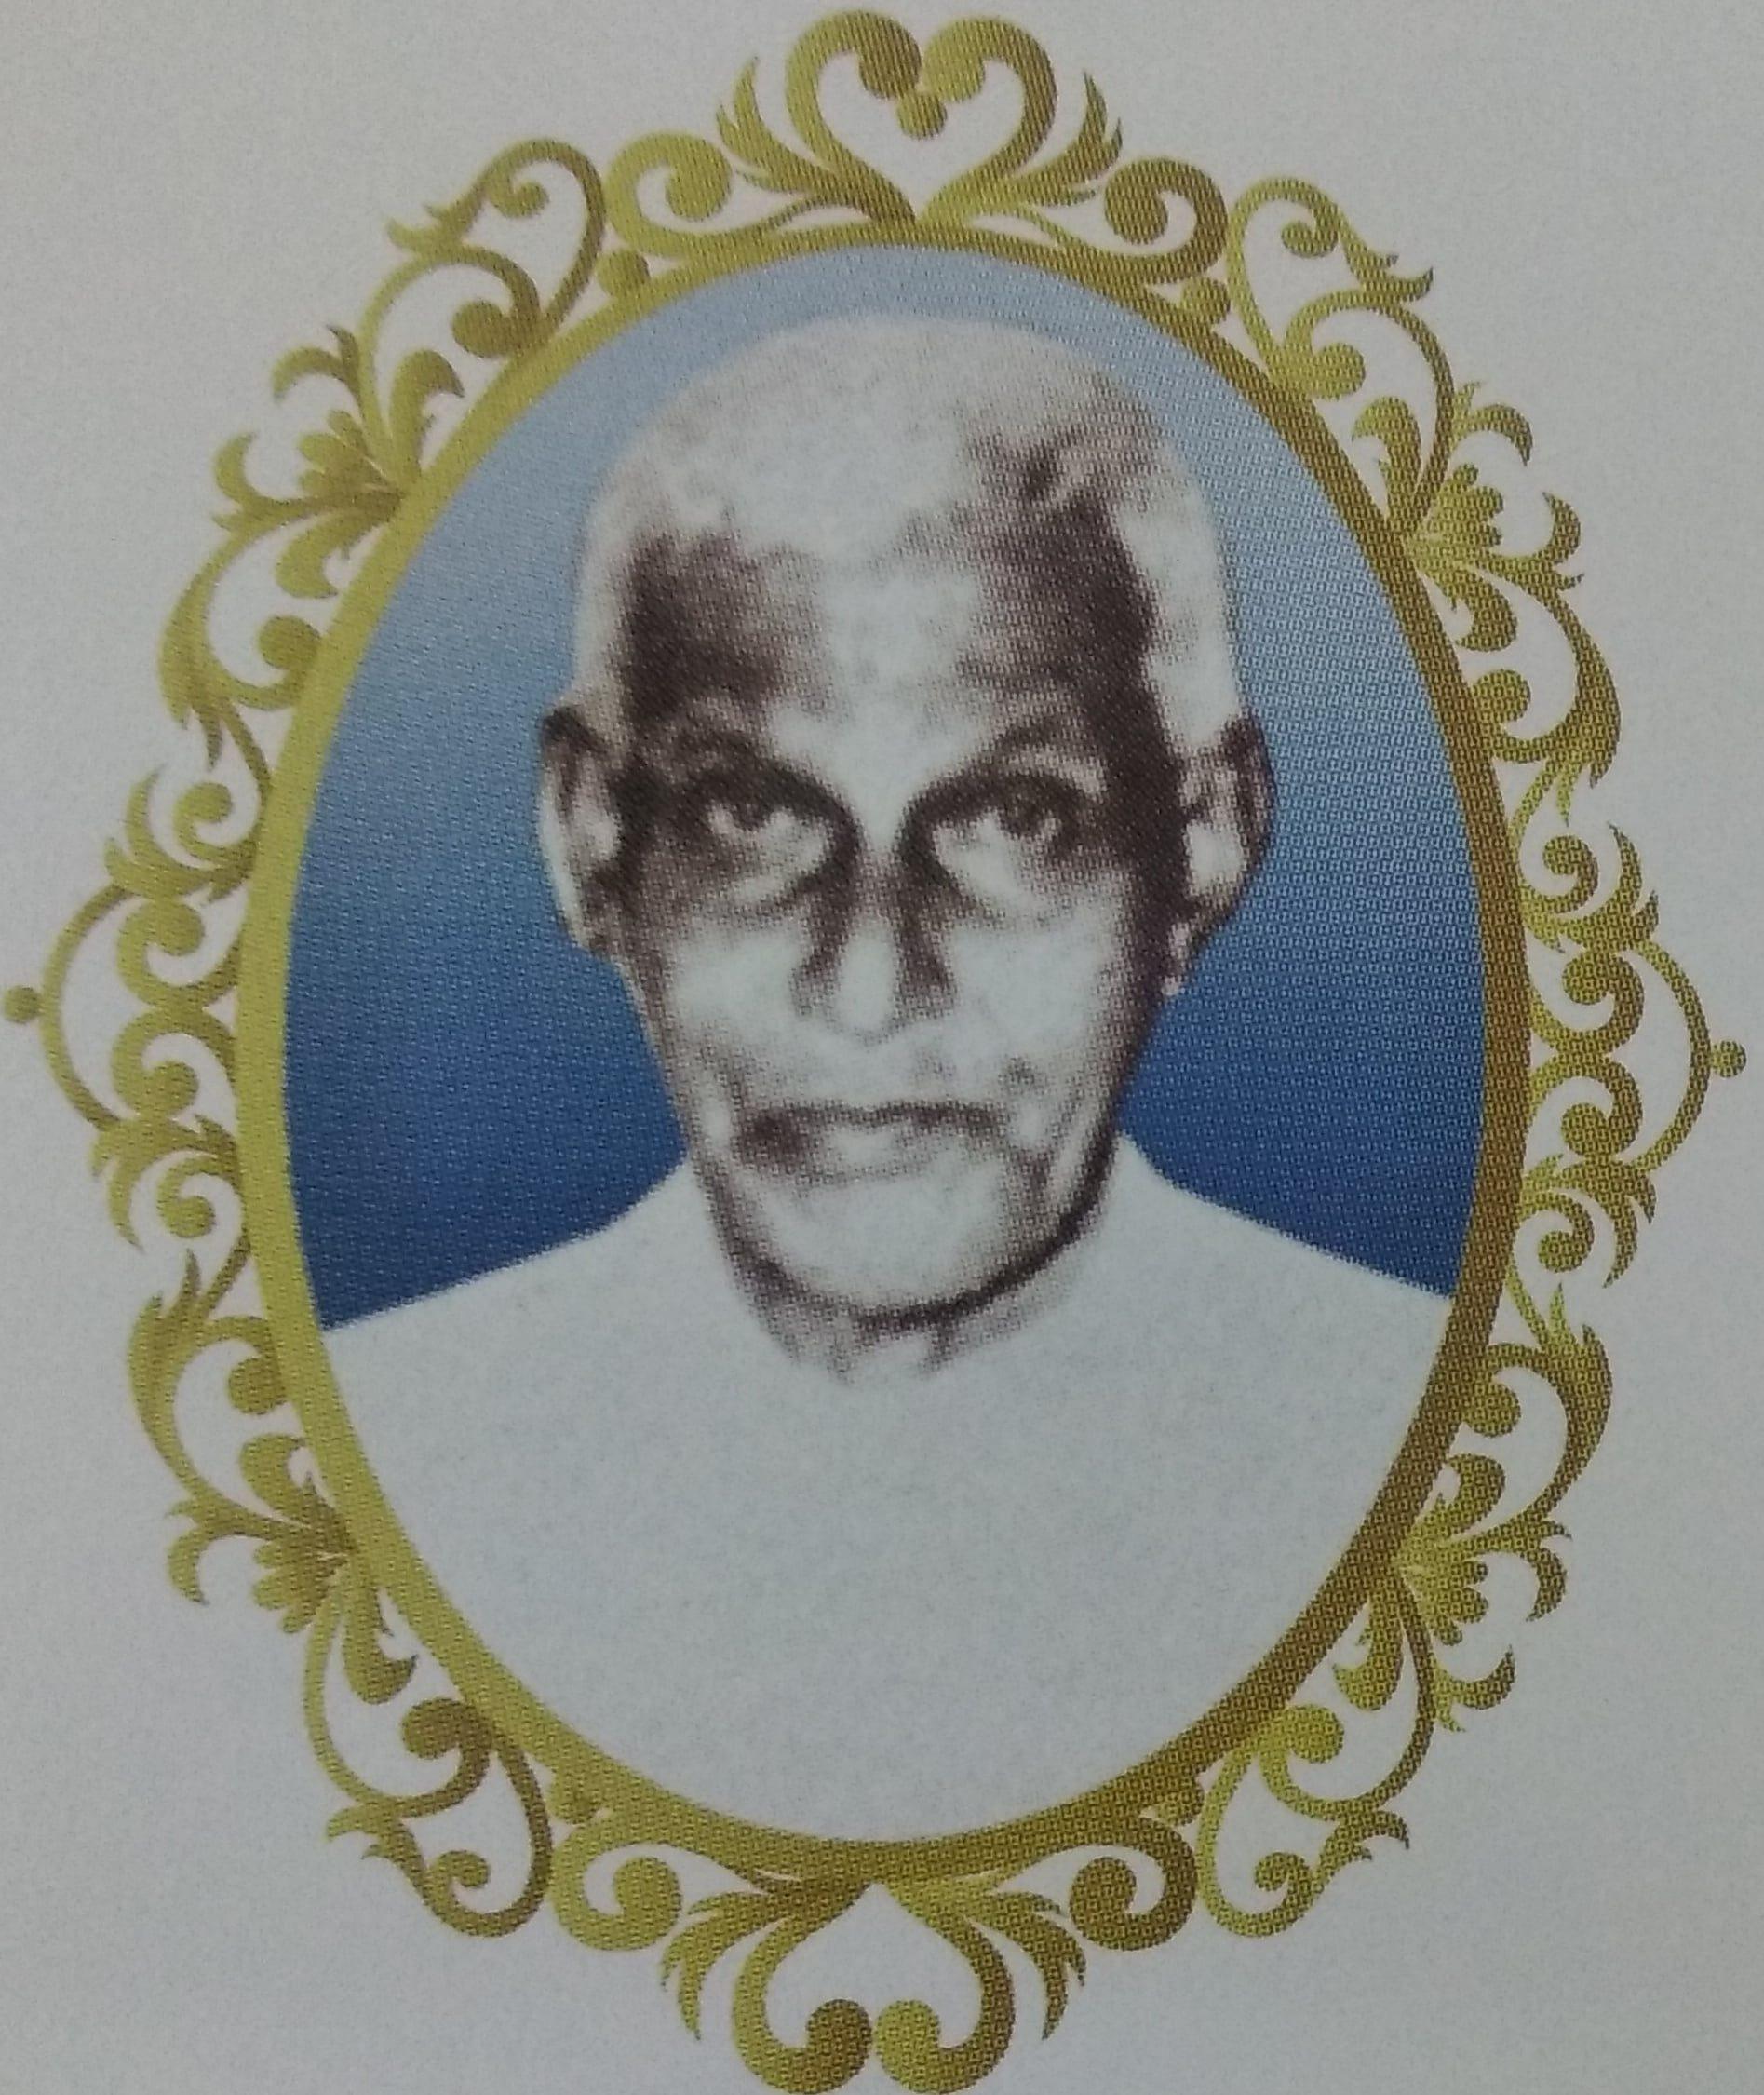 Fr. Michael Olattupuram